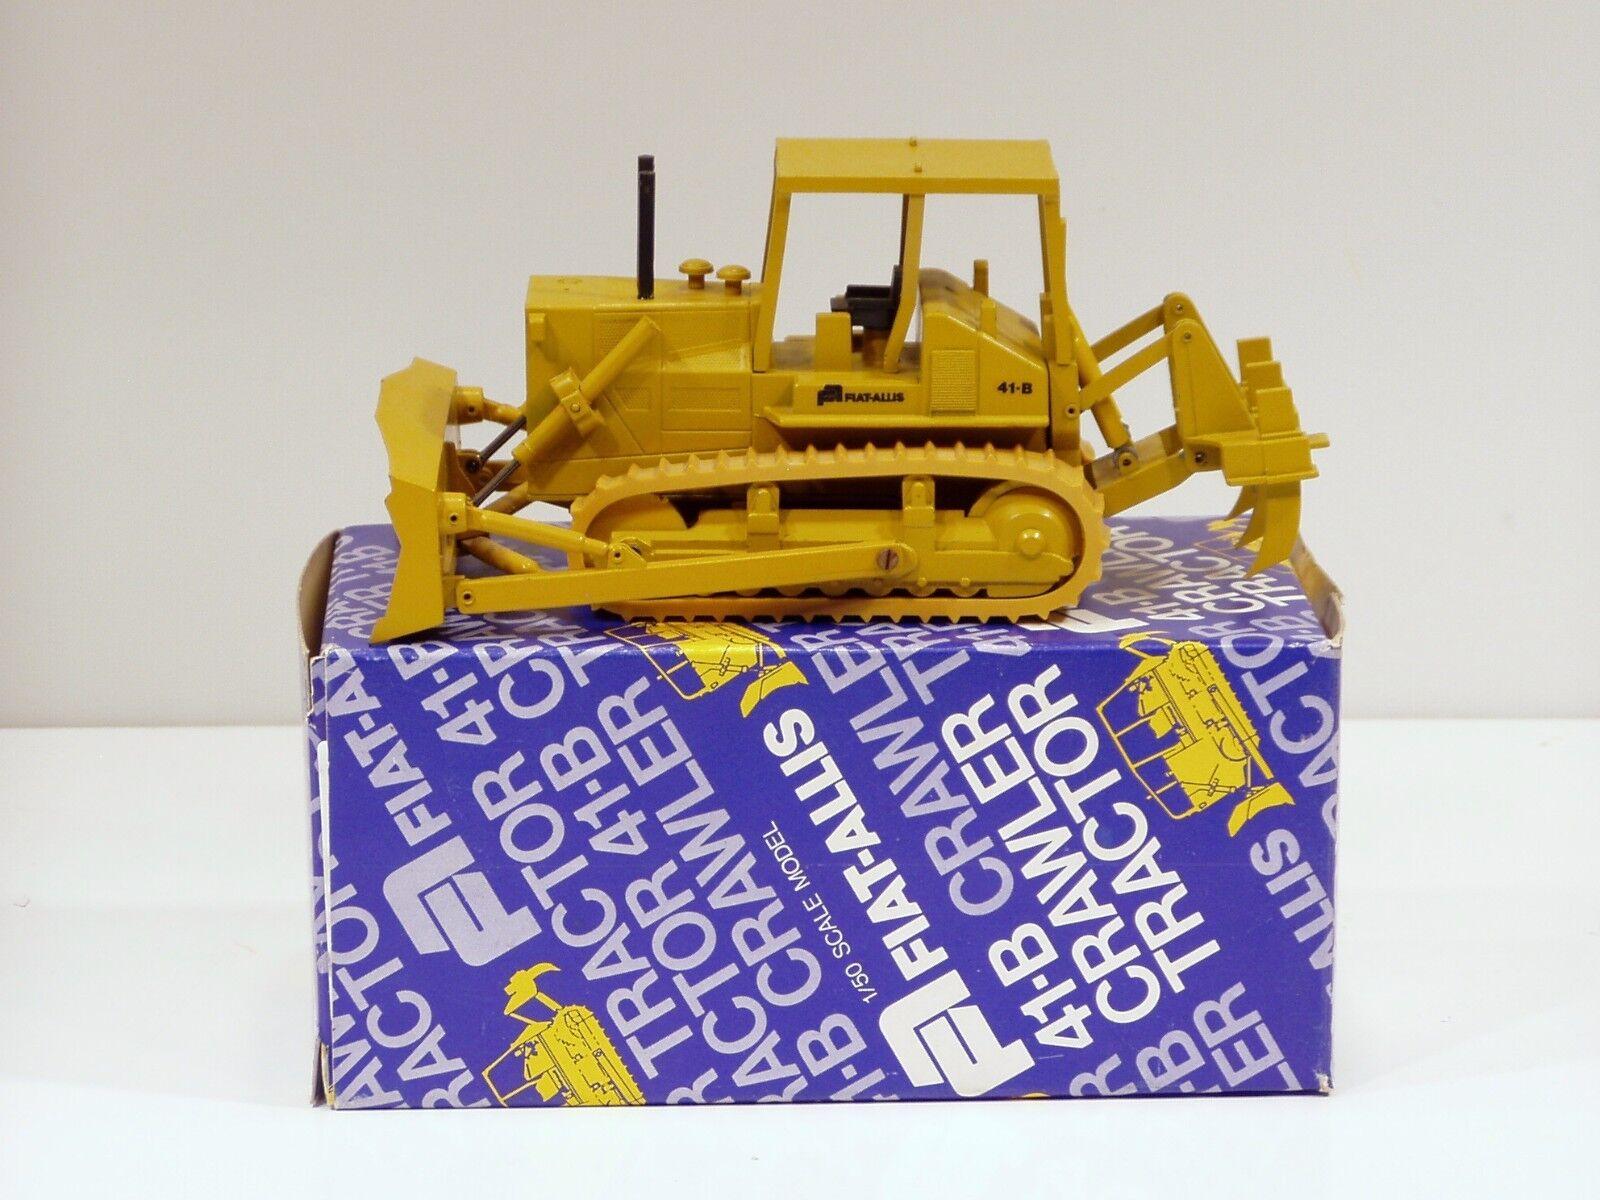 FIAT ALLIS 41B DOZER - 1 50 - Conrad  2910 - N. Comme neuf IN BOX